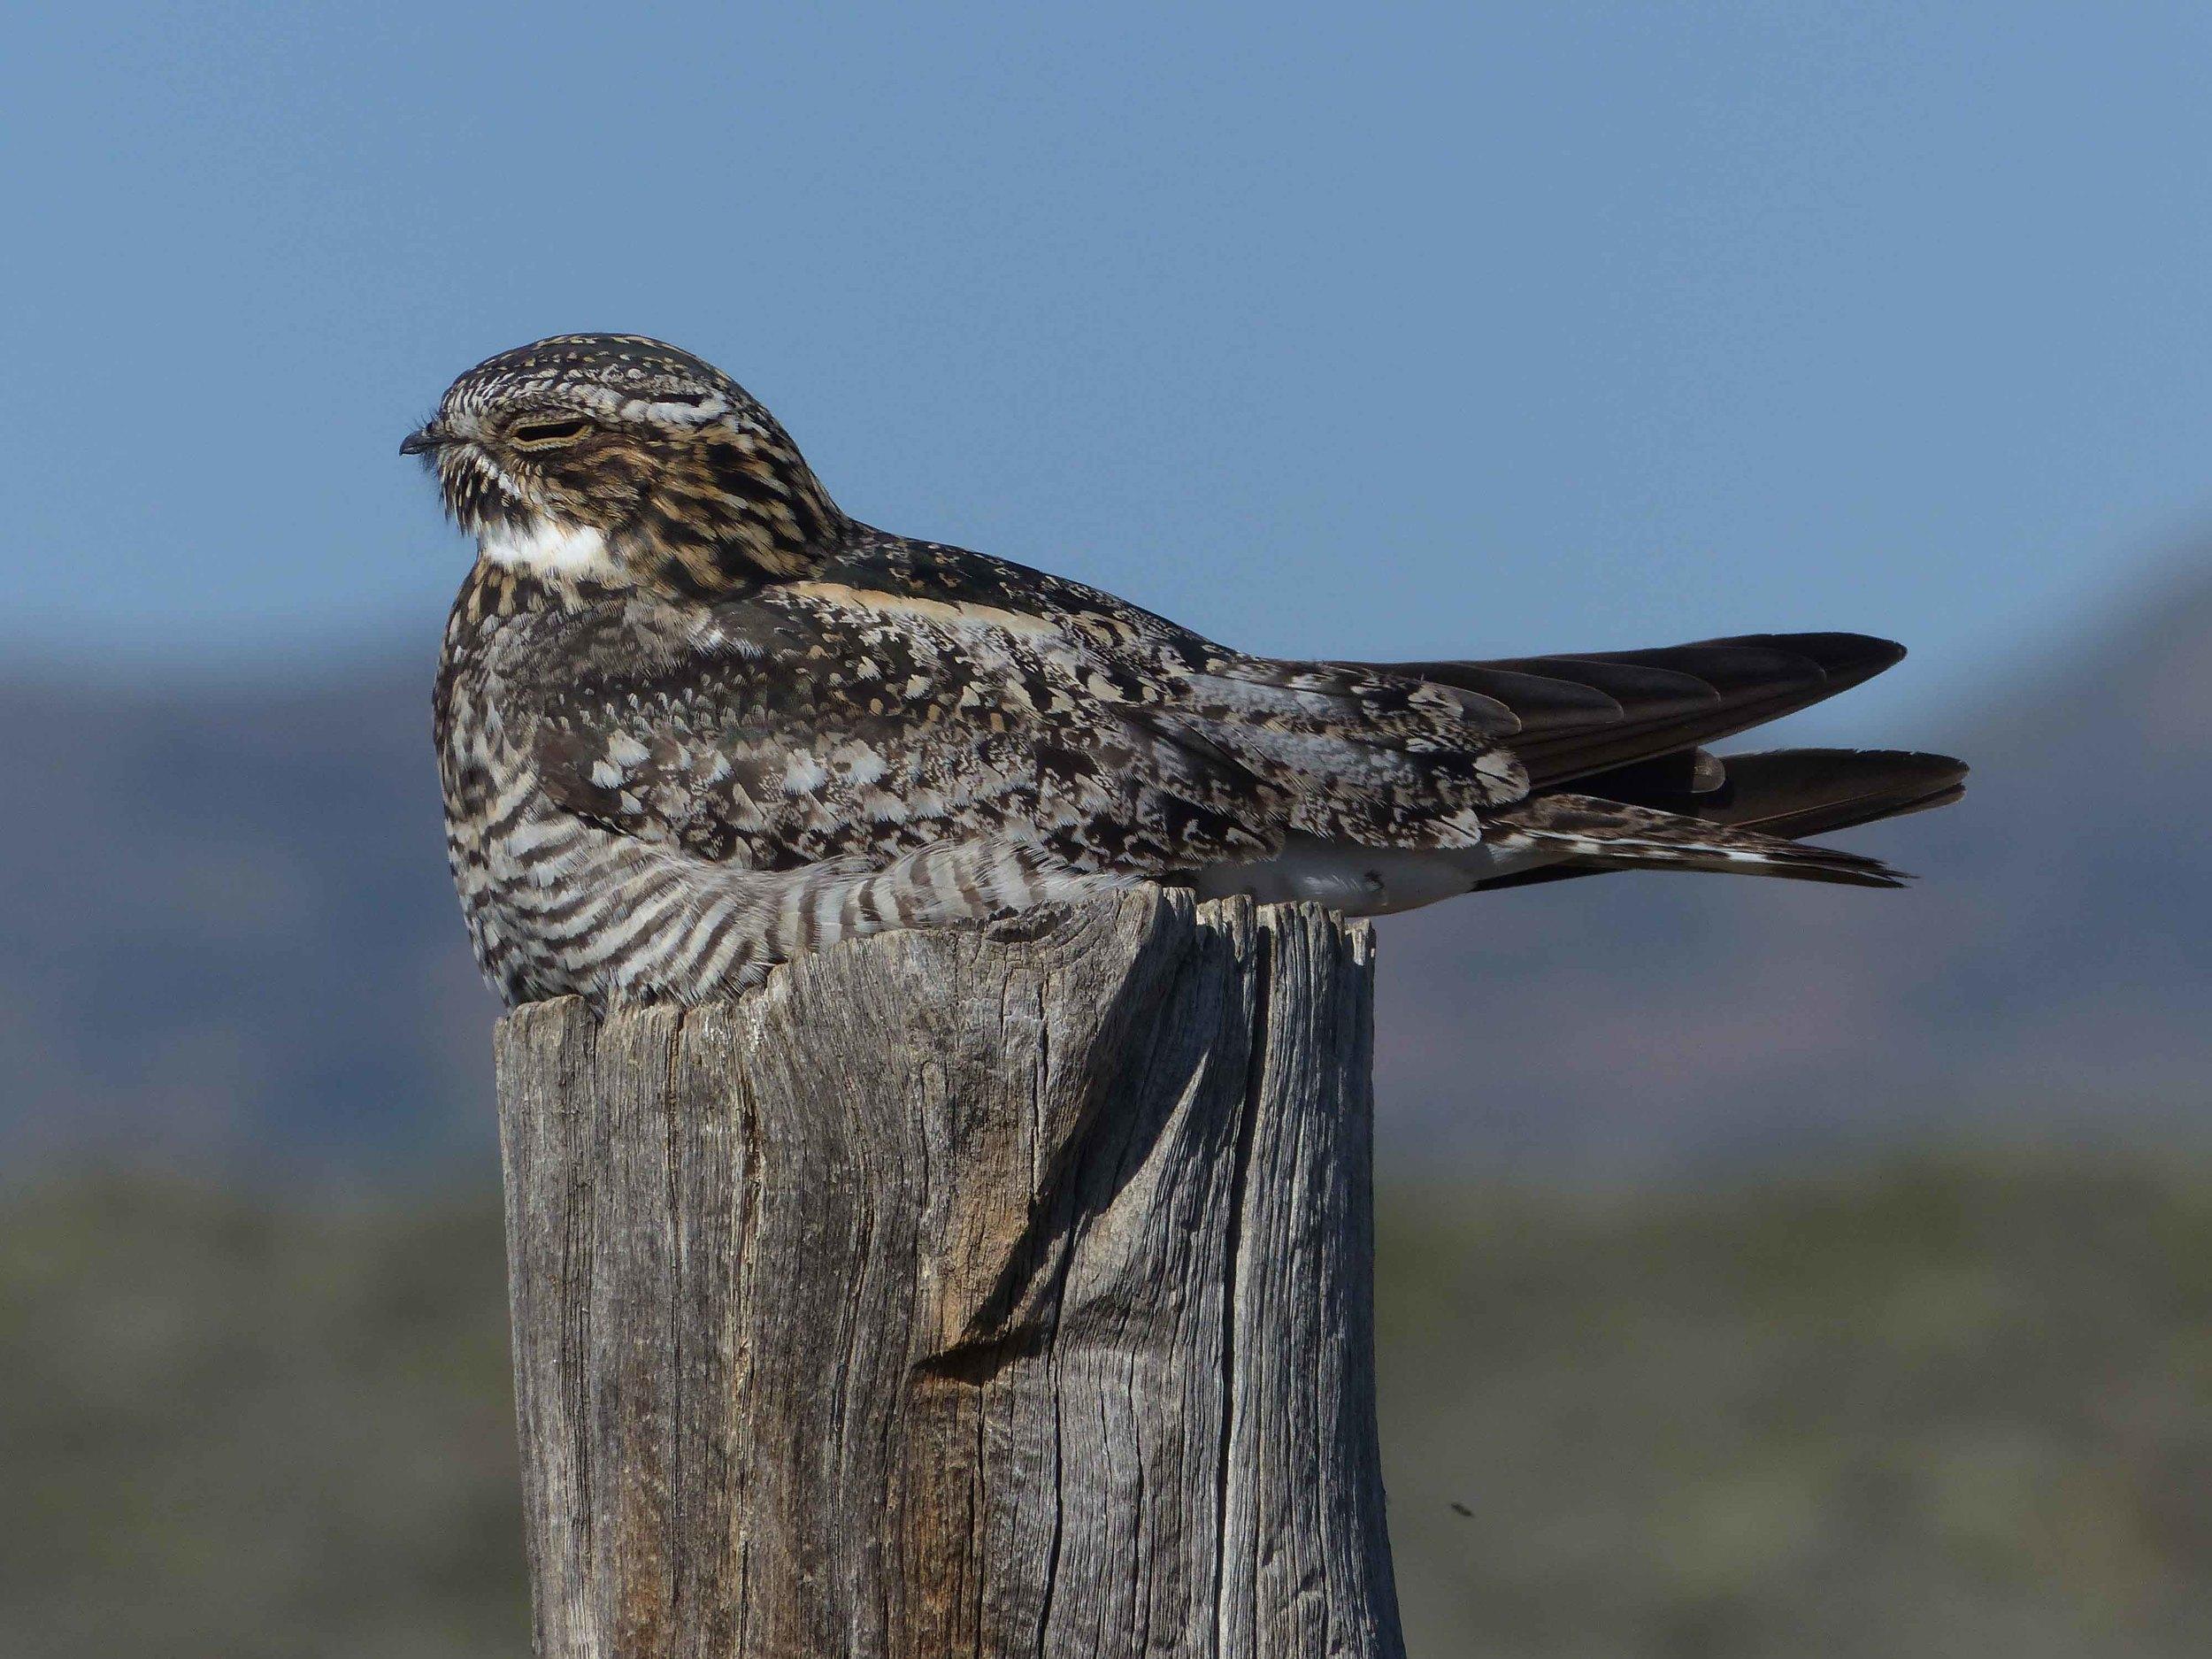 bcn P1160091 Common Nighthawk sitting.jpg